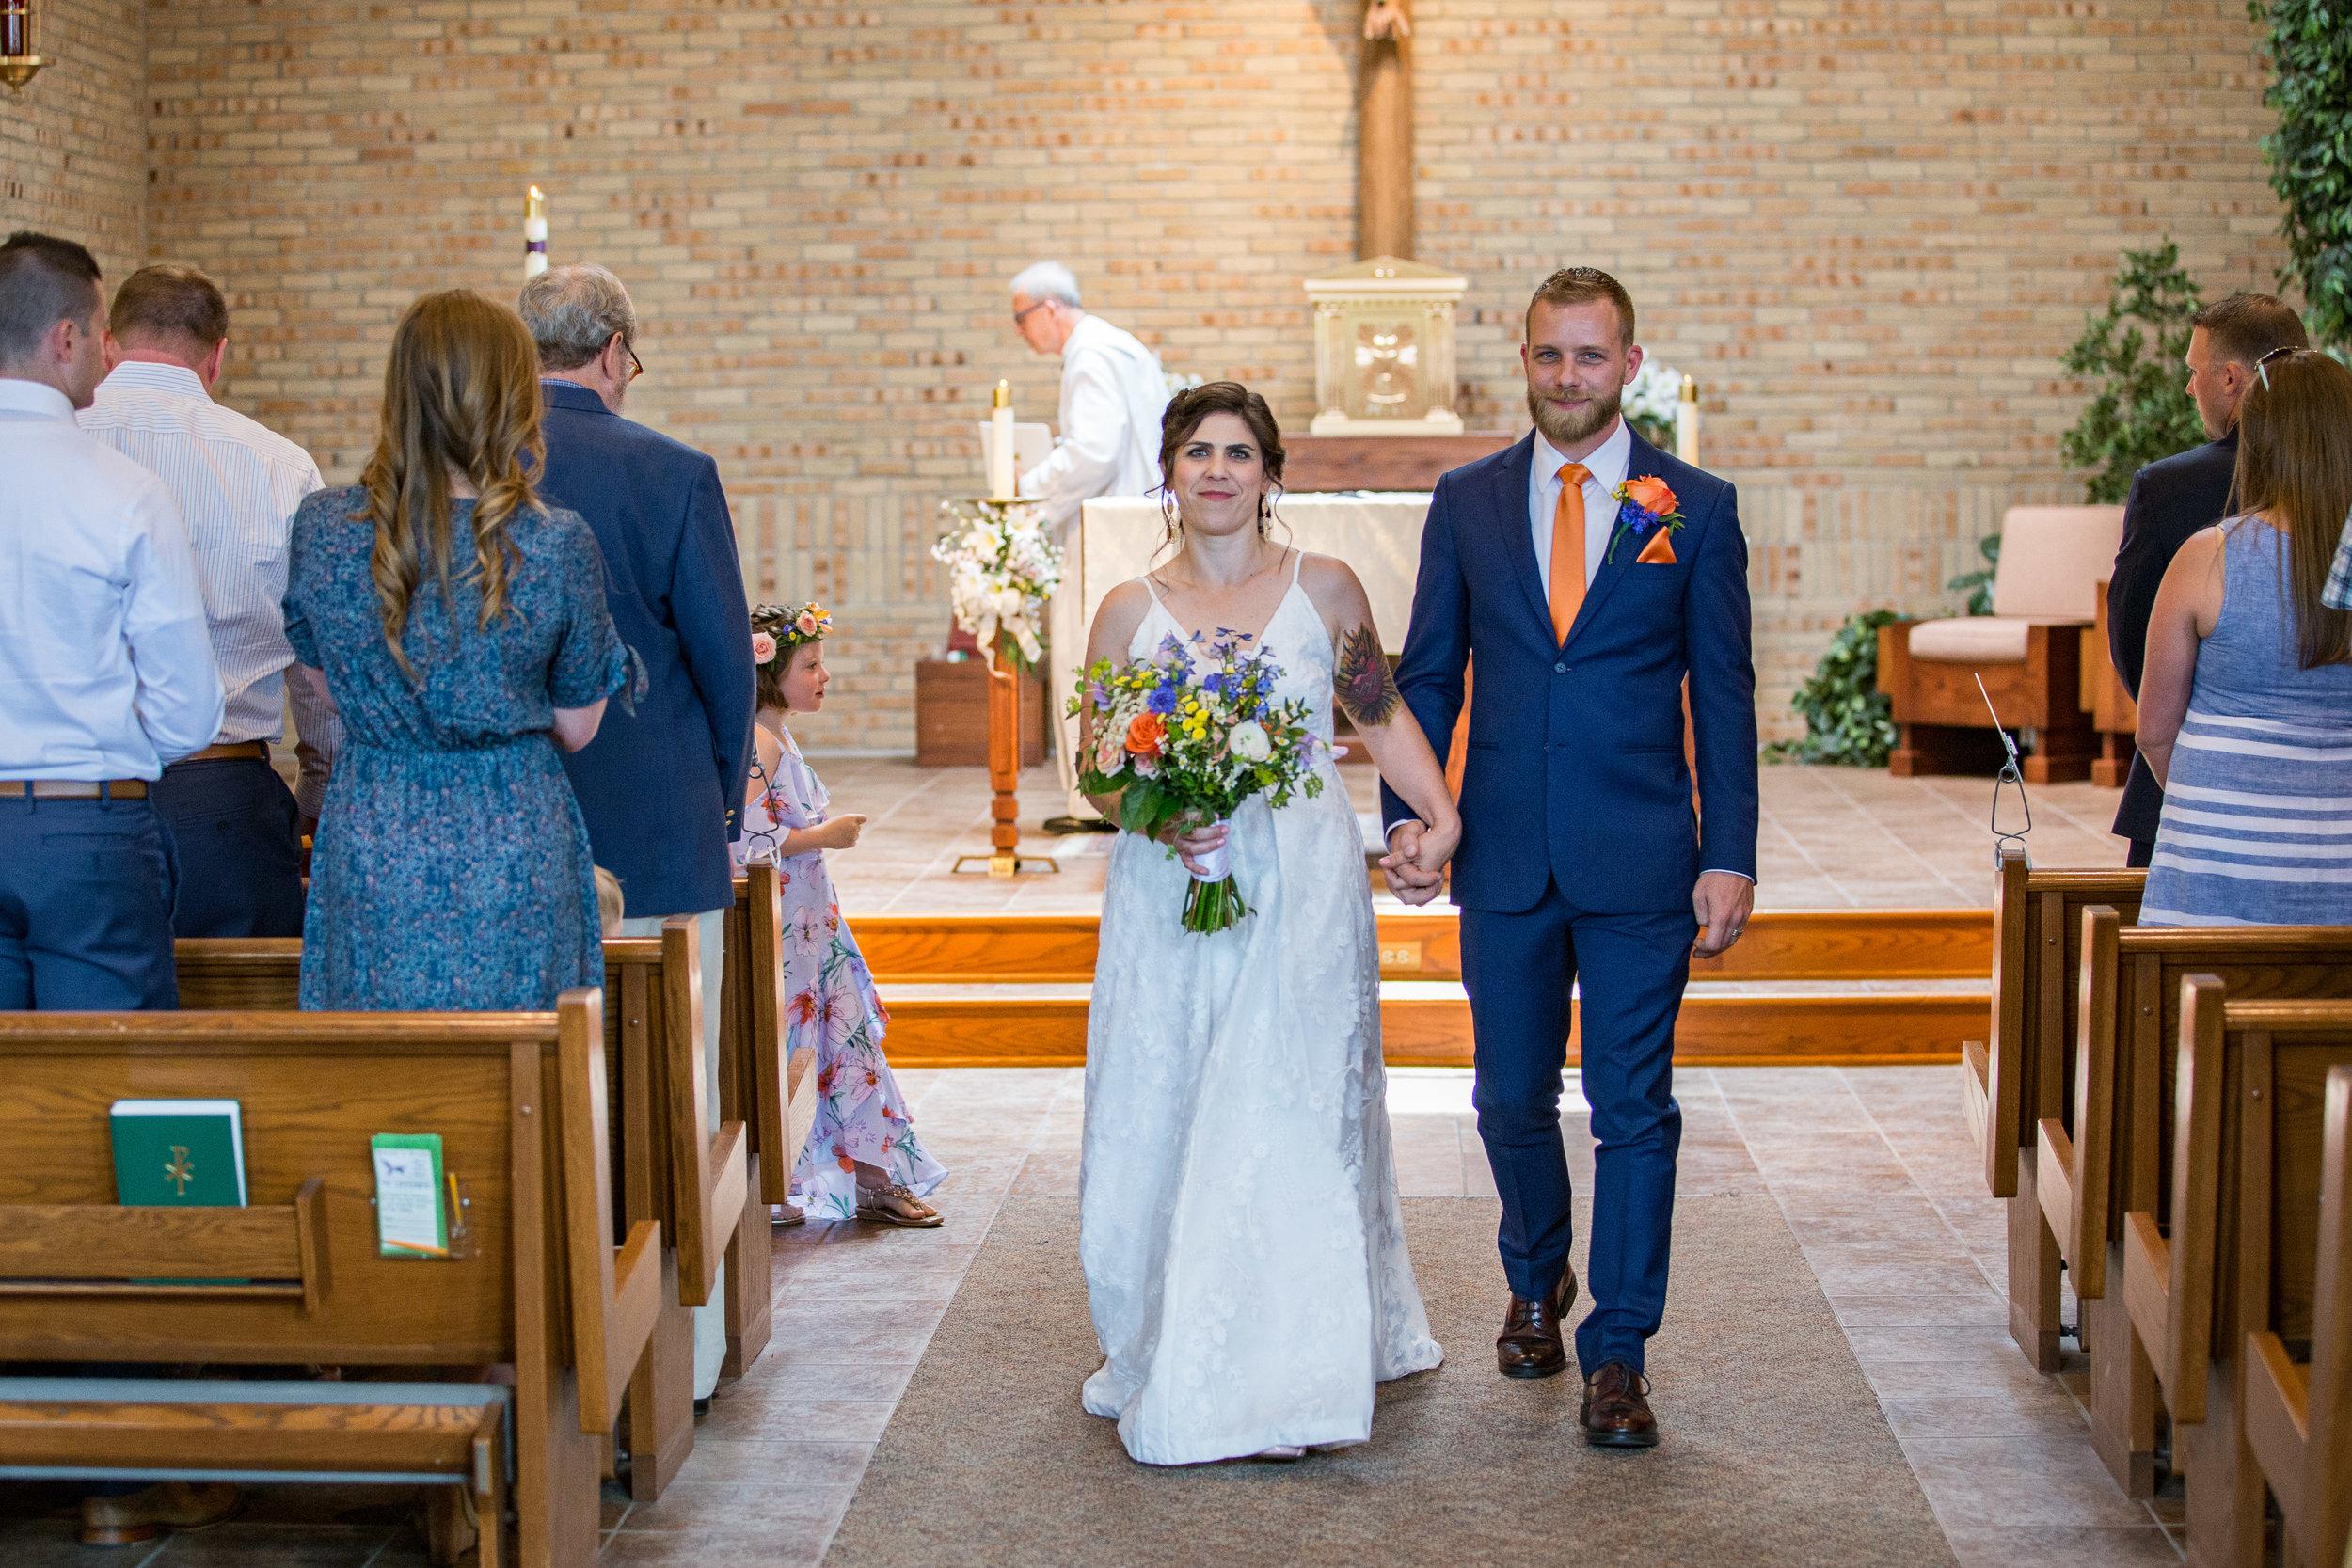 Natalie and Dallas Mooney Wedding 6-8-19_Tania Watt Photography-149.jpg